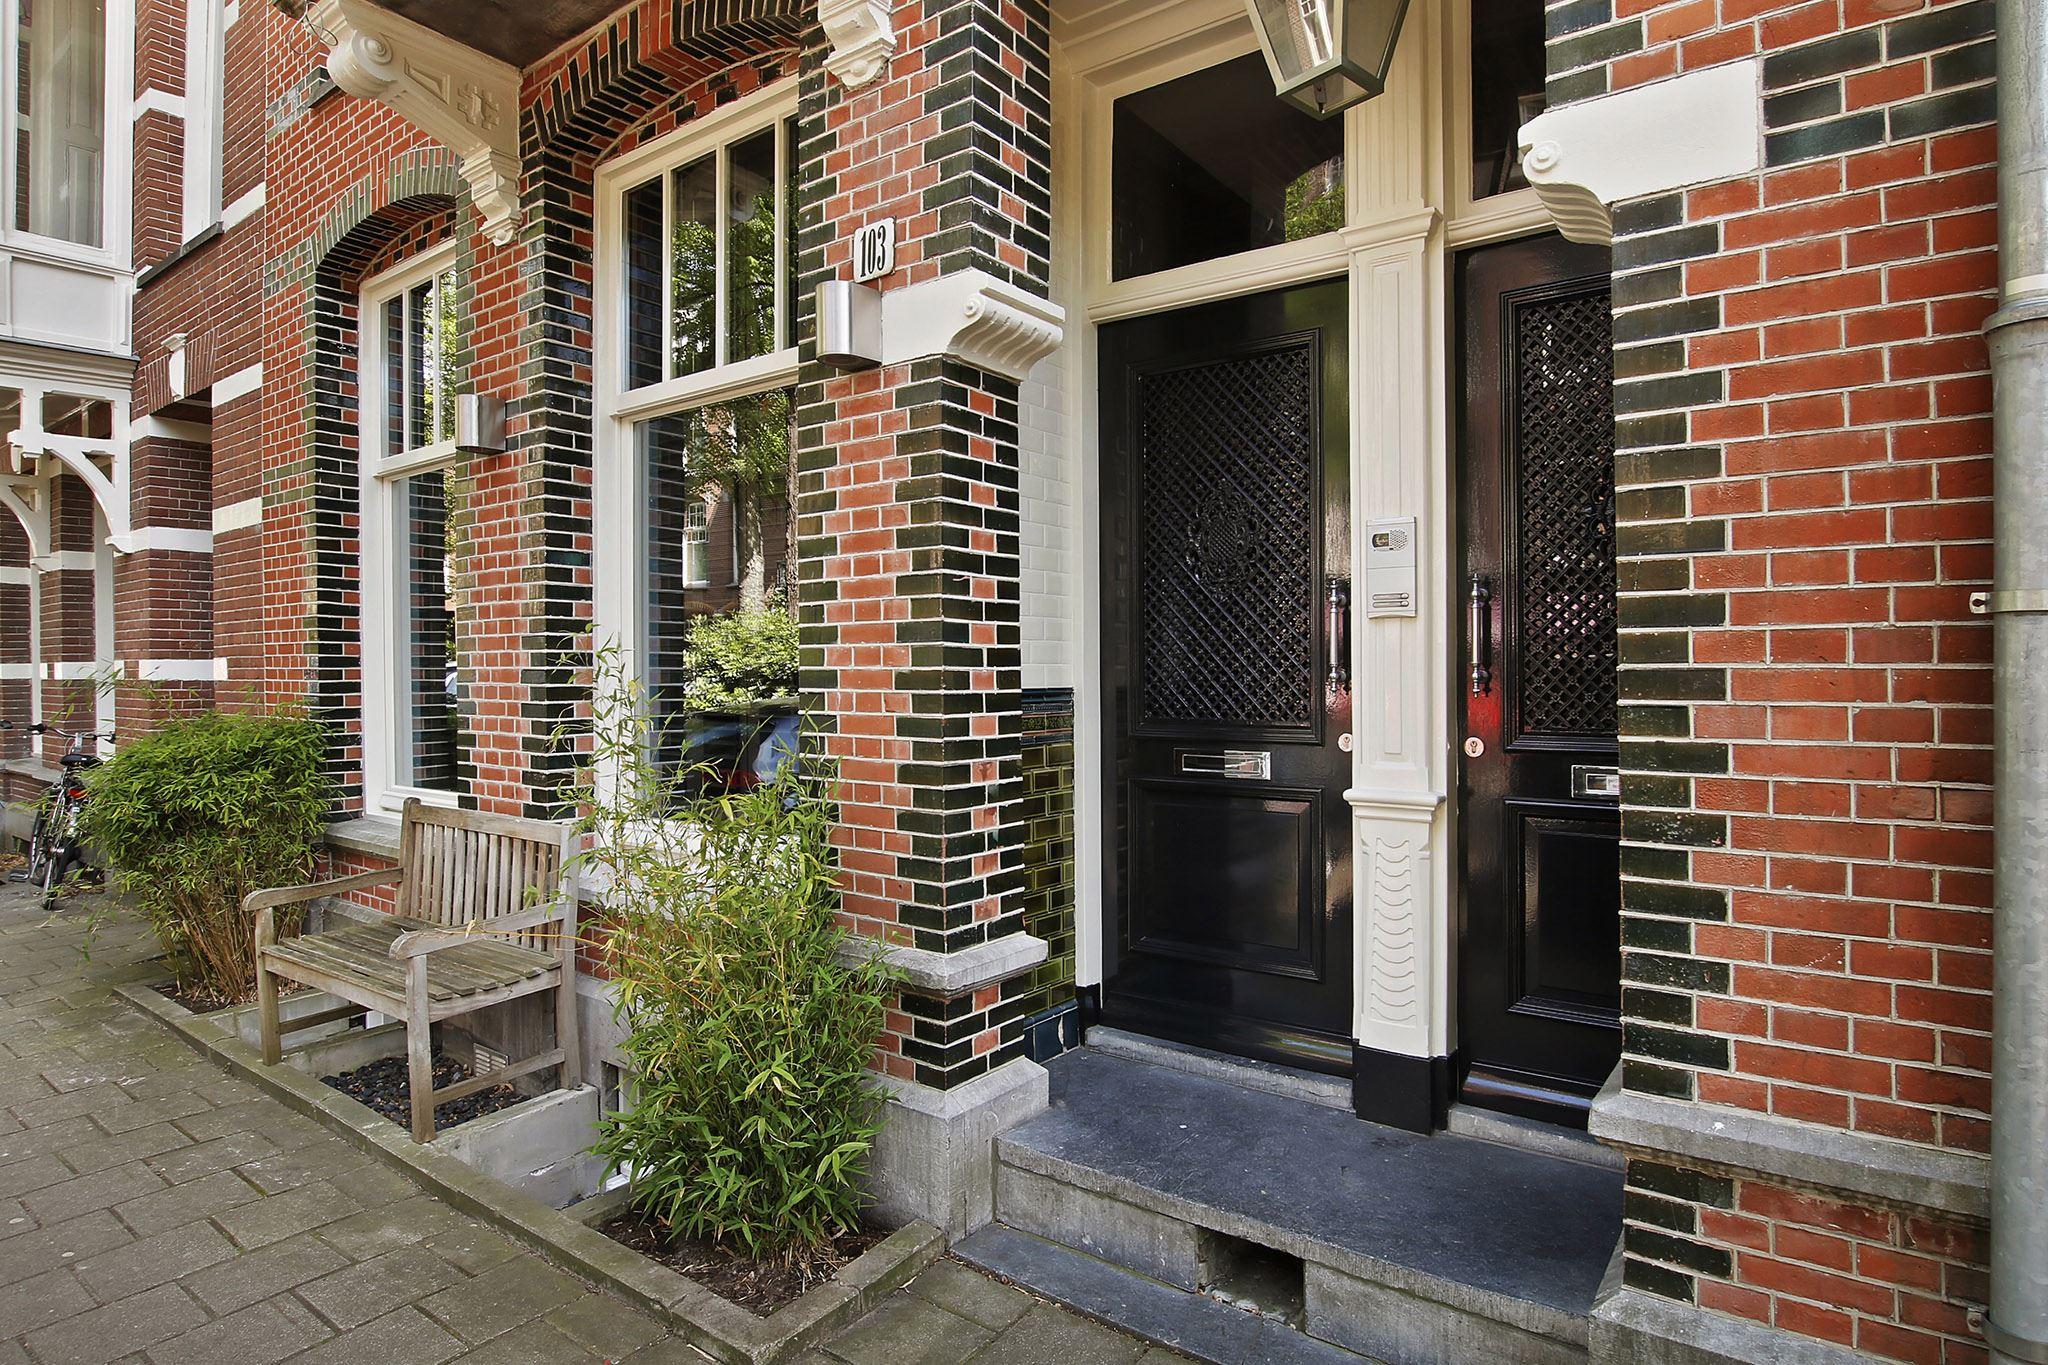 фасад дома таунхауса кирпич клинкер входная дверь